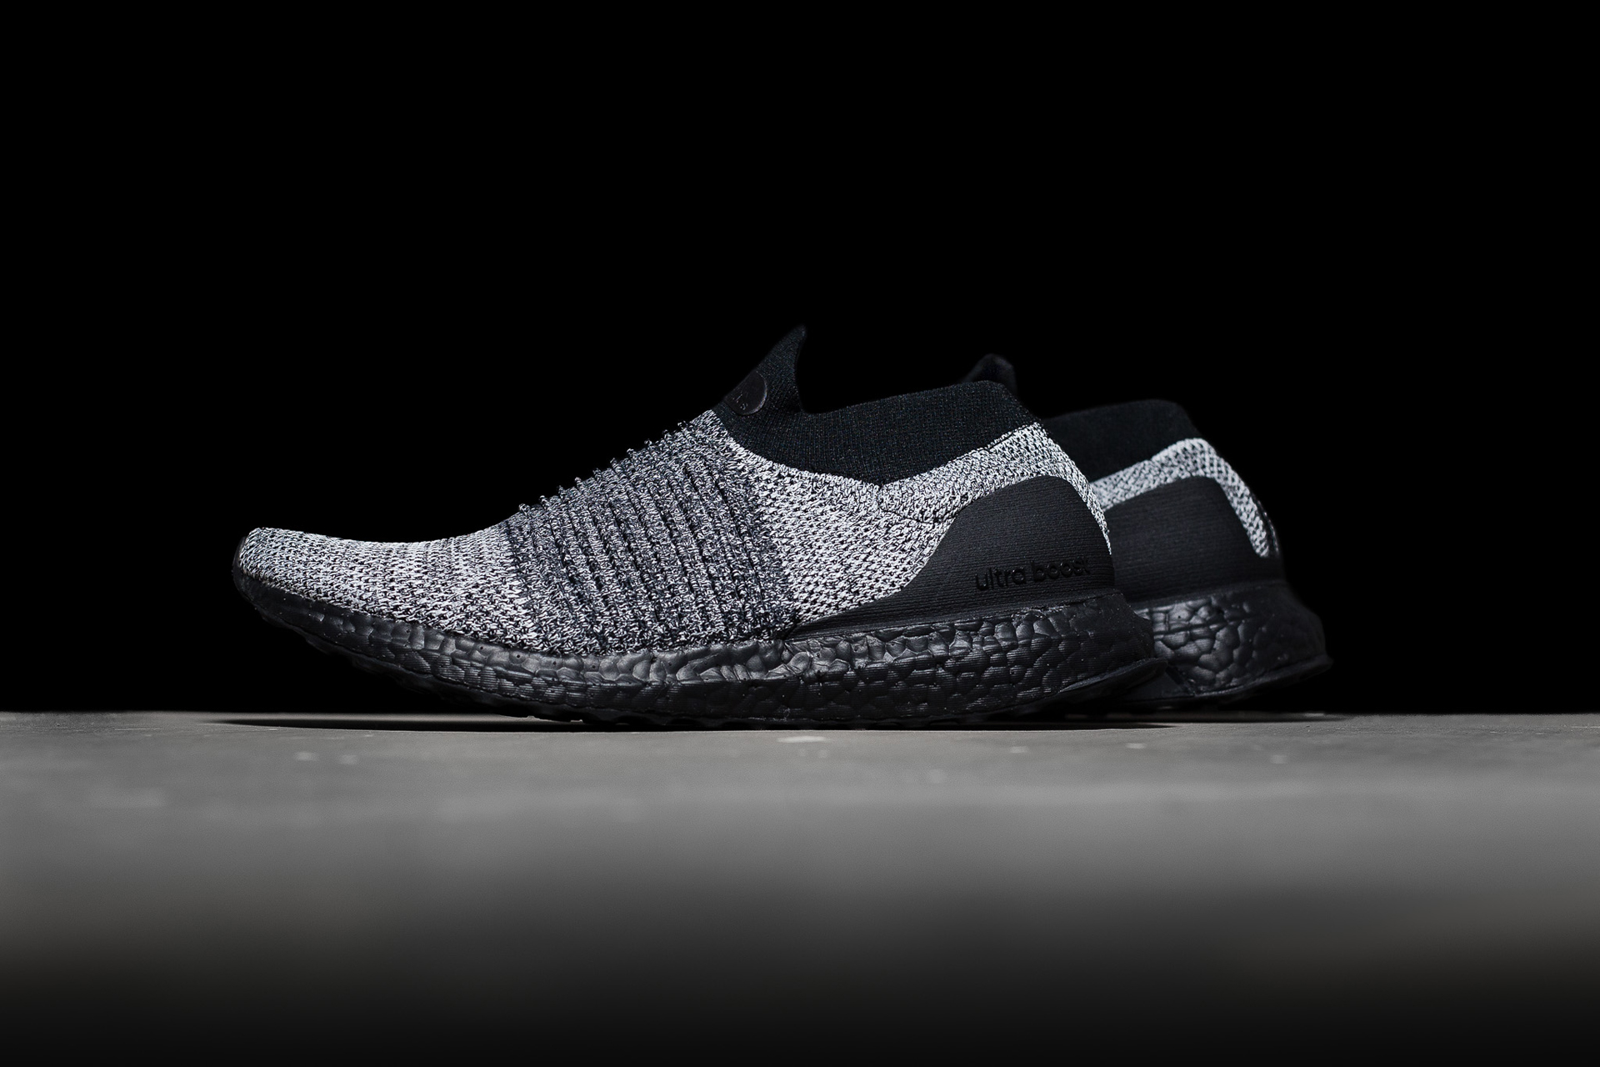 476e9a68f3d68 Haven  Releasing Soon - Nike Air Max 270   adidas Ultraboost ...